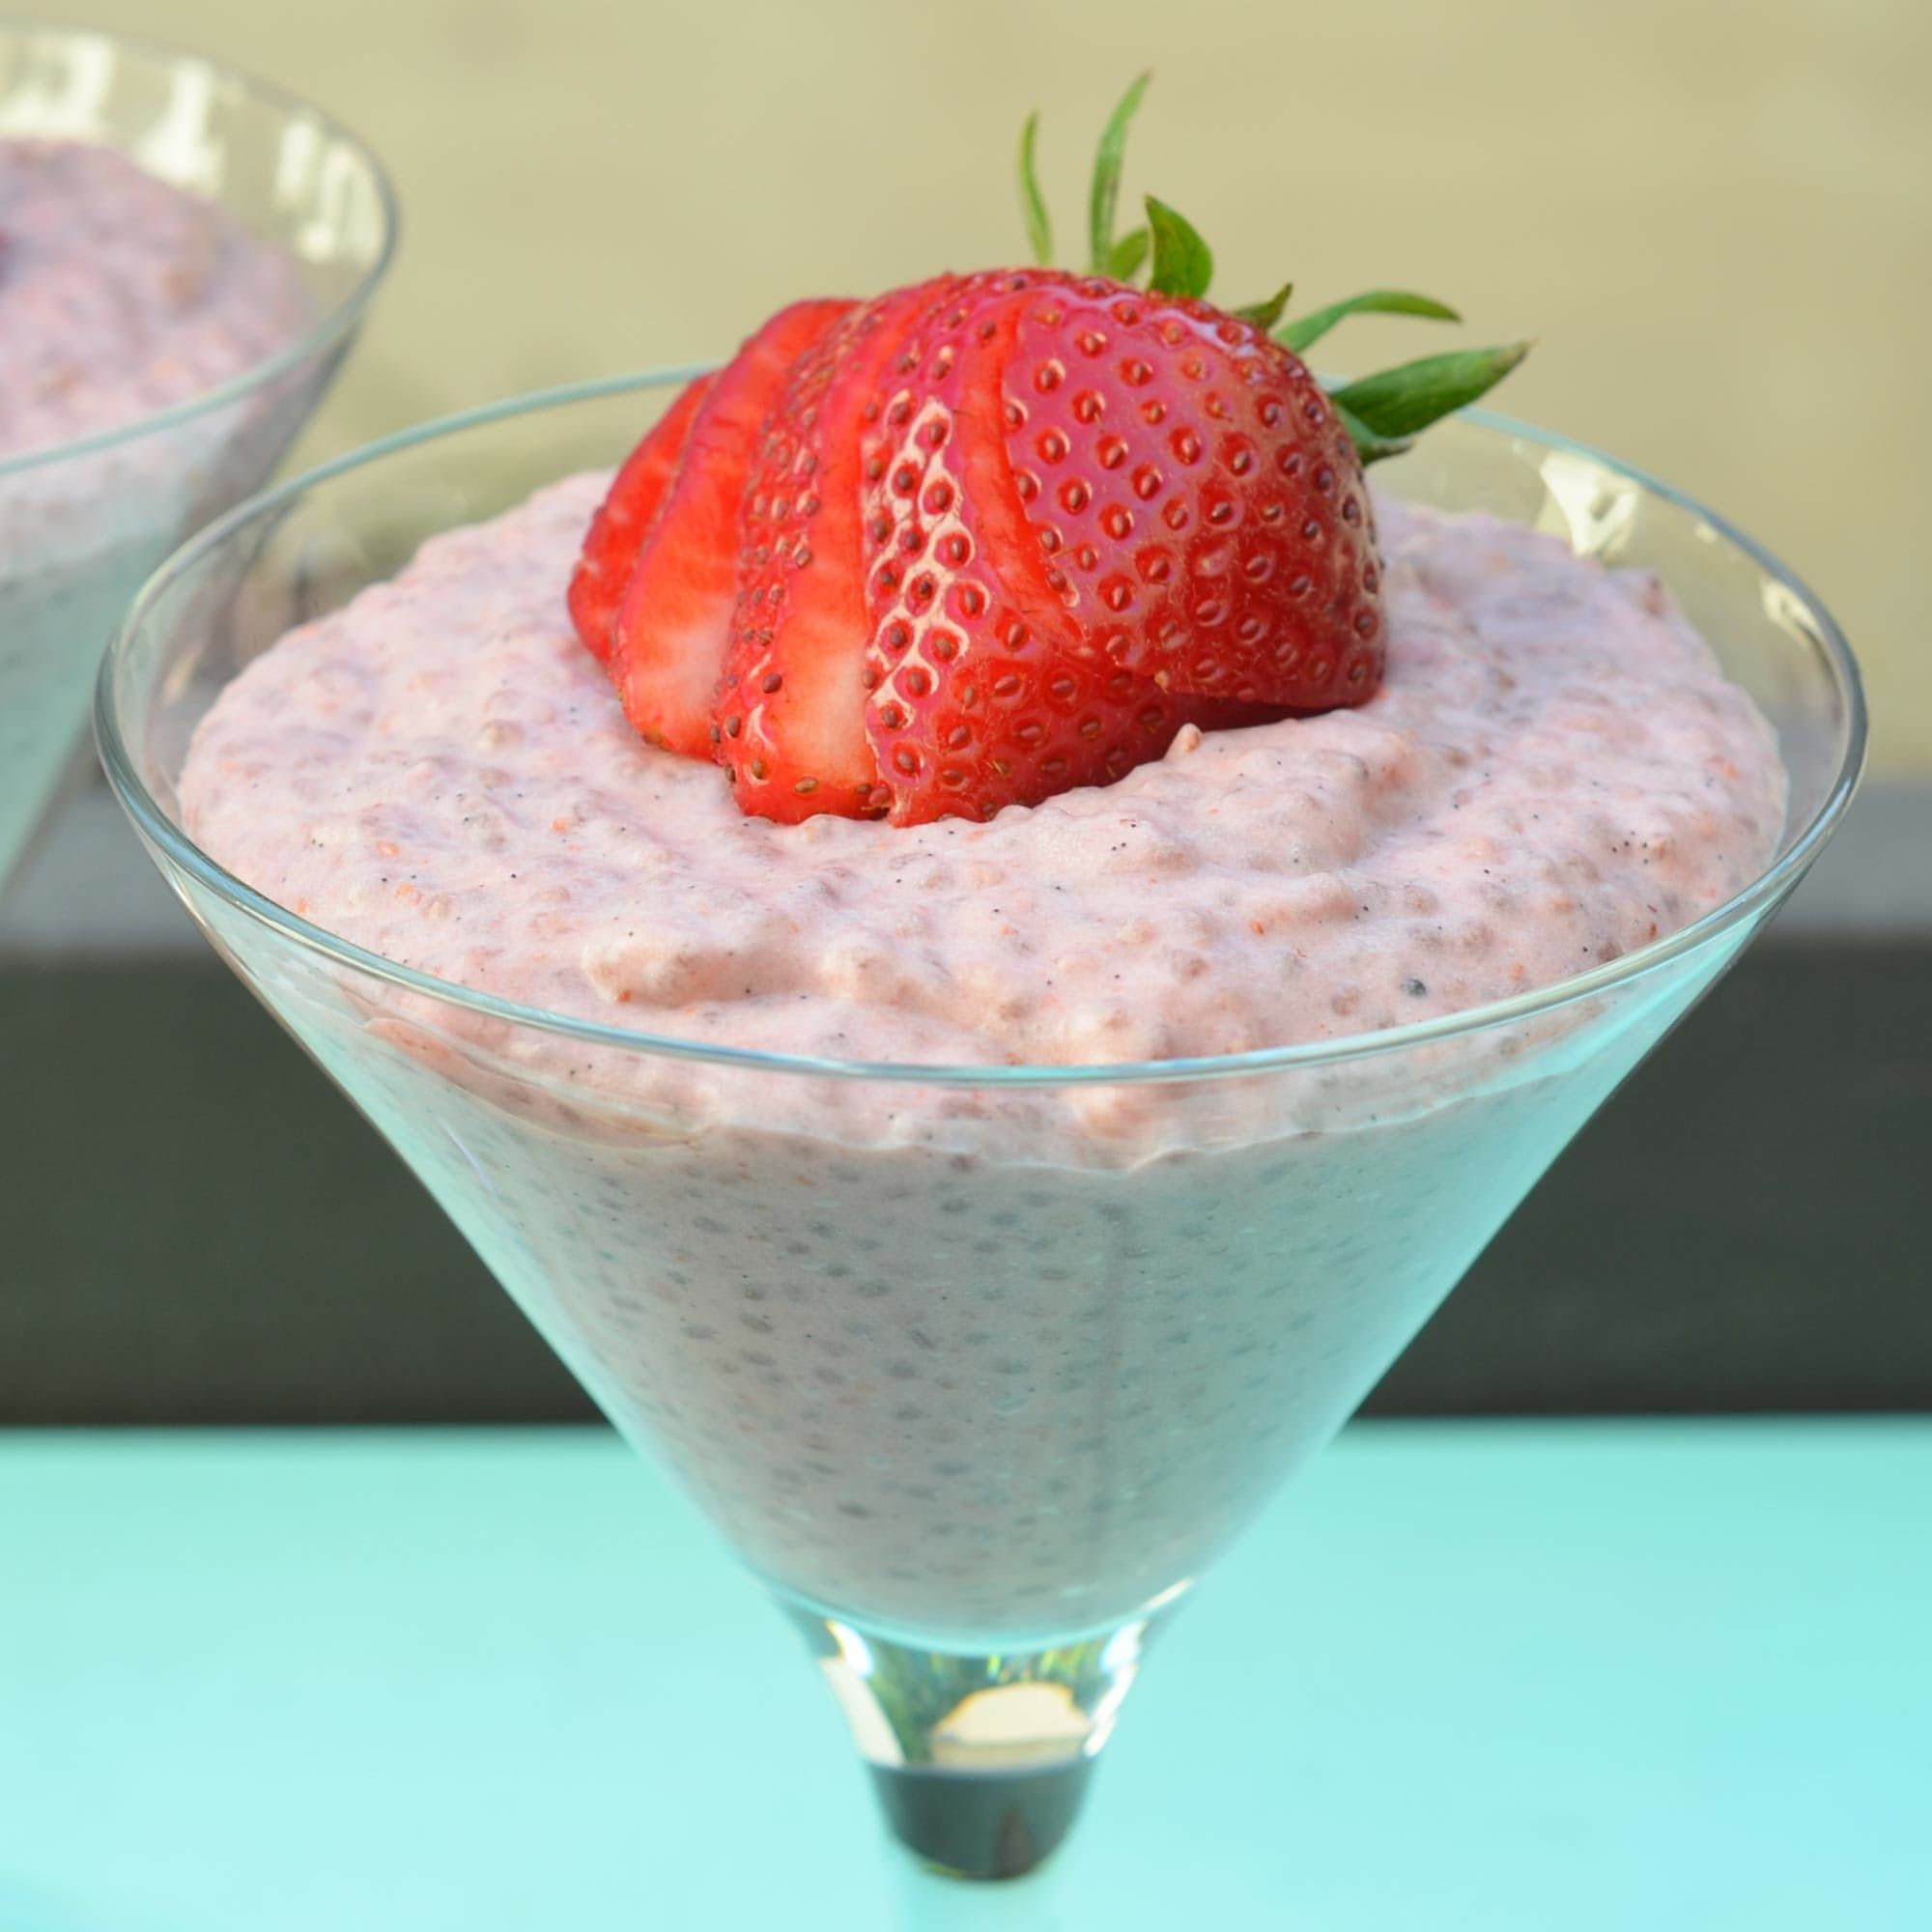 Dairy-Free Dessert Recipe: Strawberries &